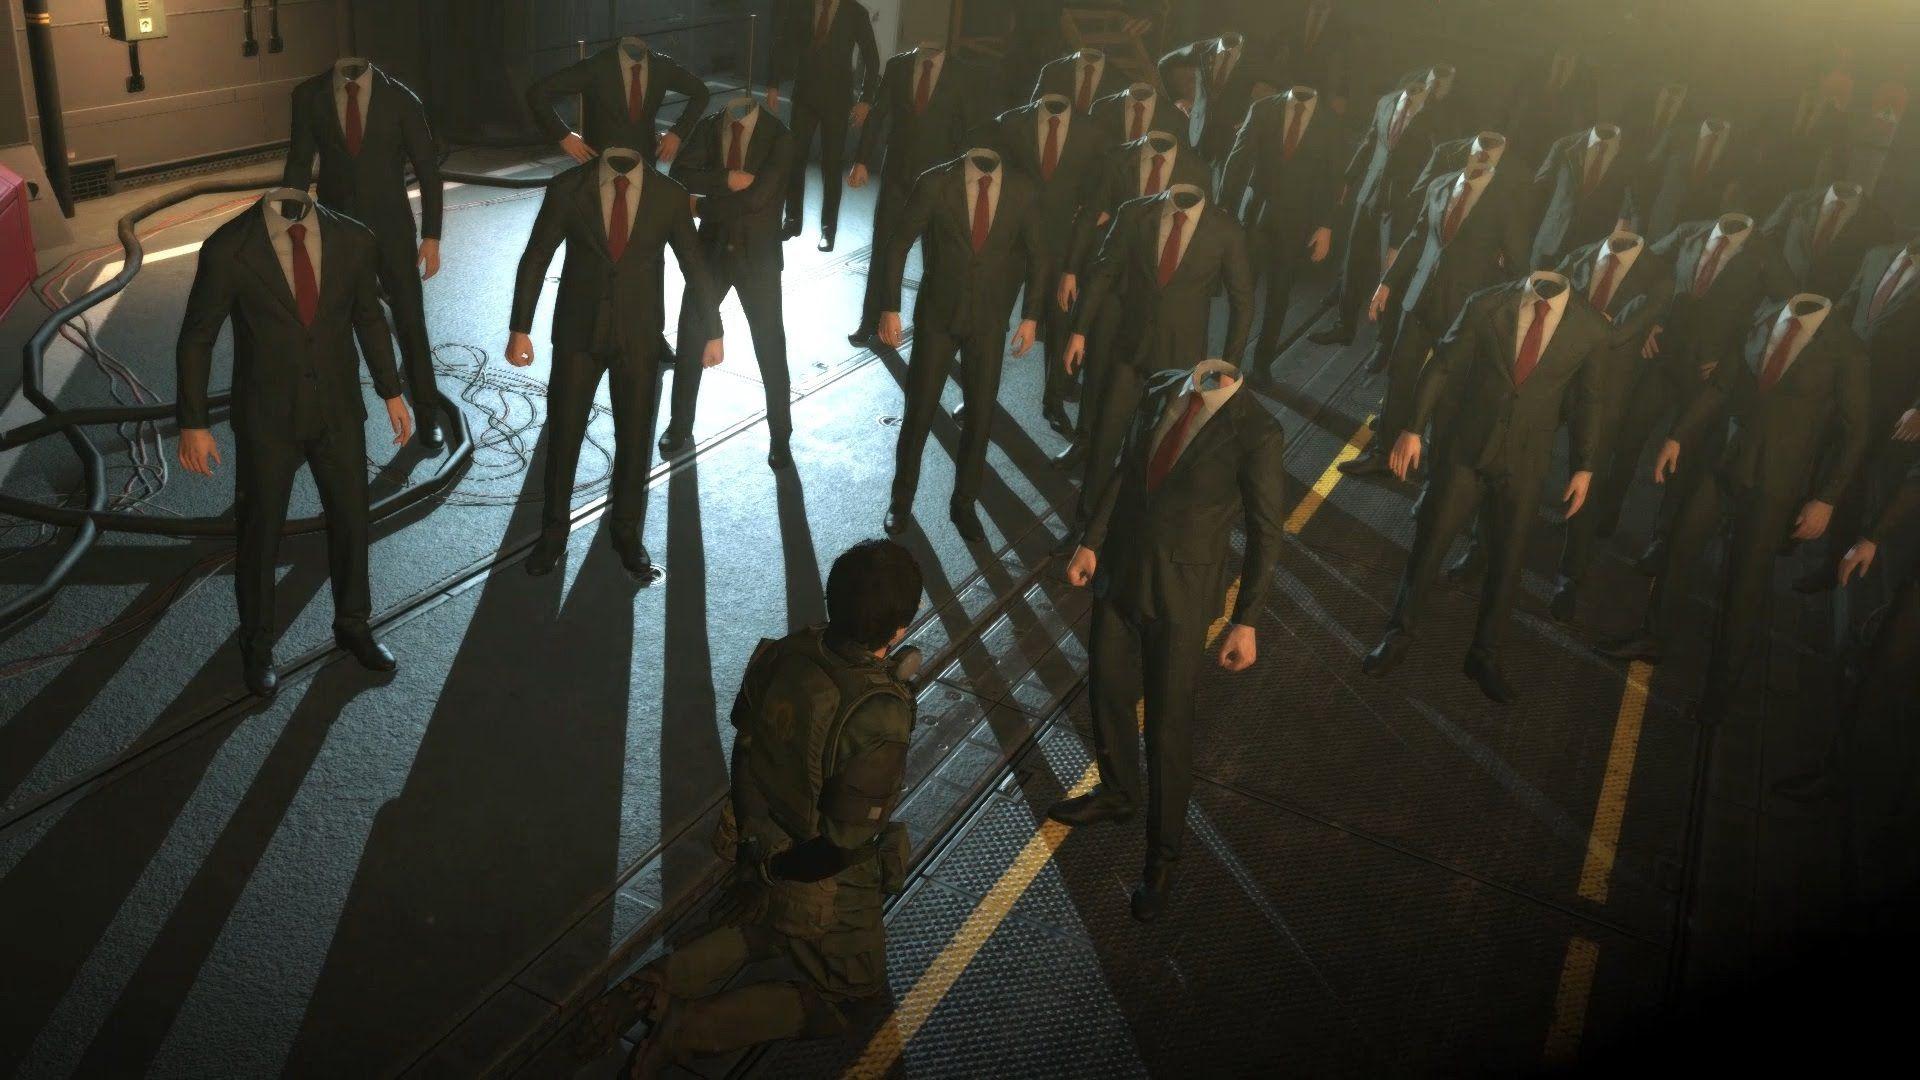 Lakitouille's take on Survive #MetalGearSolid #mgs #MGSV #MetalGear #Konami #cosplay #PS4 #game #MGSVTPP